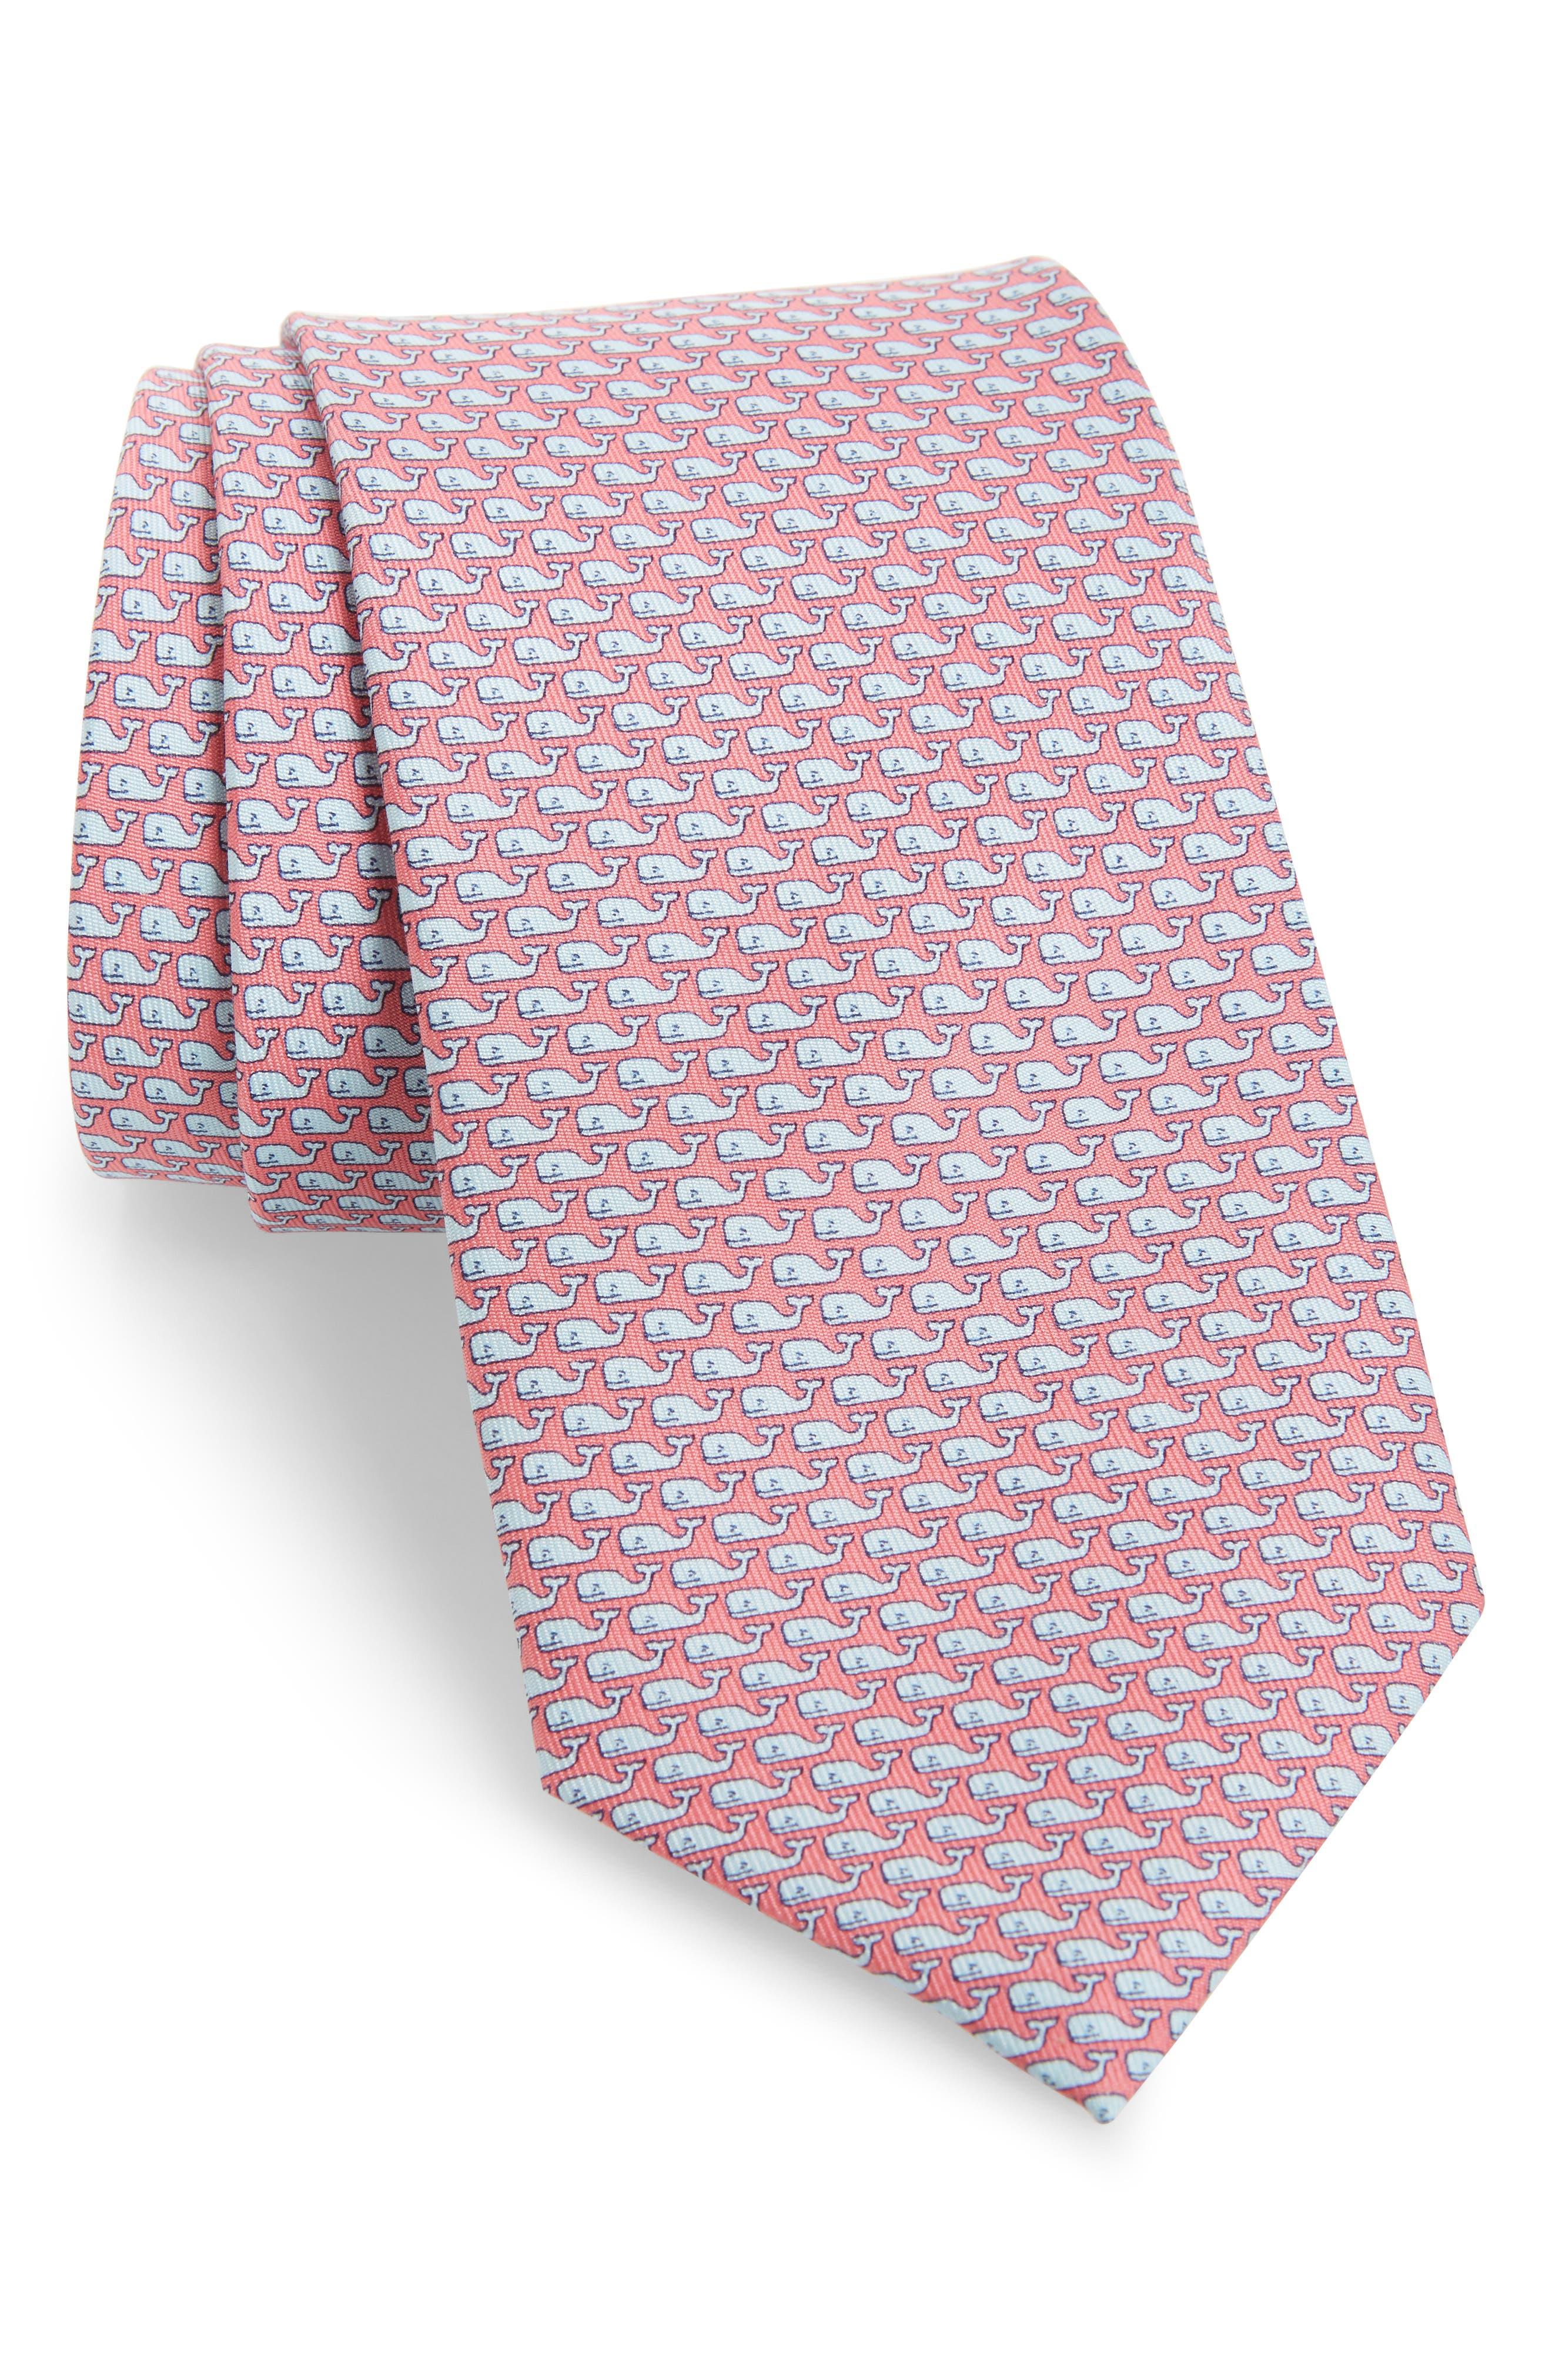 Whale Silk Tie,                         Main,                         color, 670